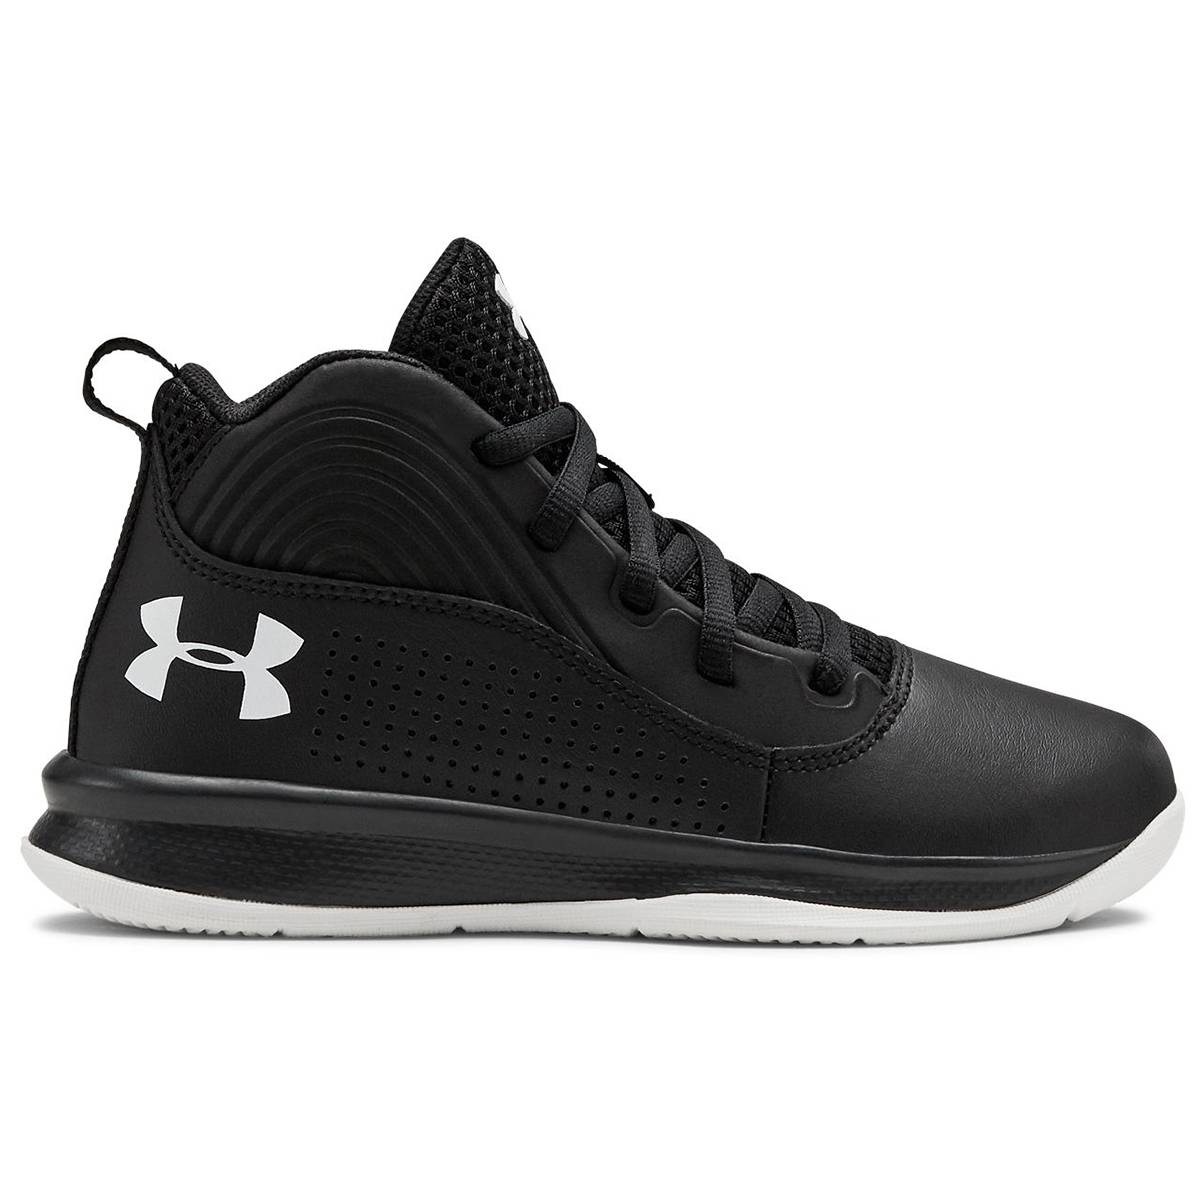 Under Armour Little Boys' Lockdown 4 Preschool Basketball Shoes